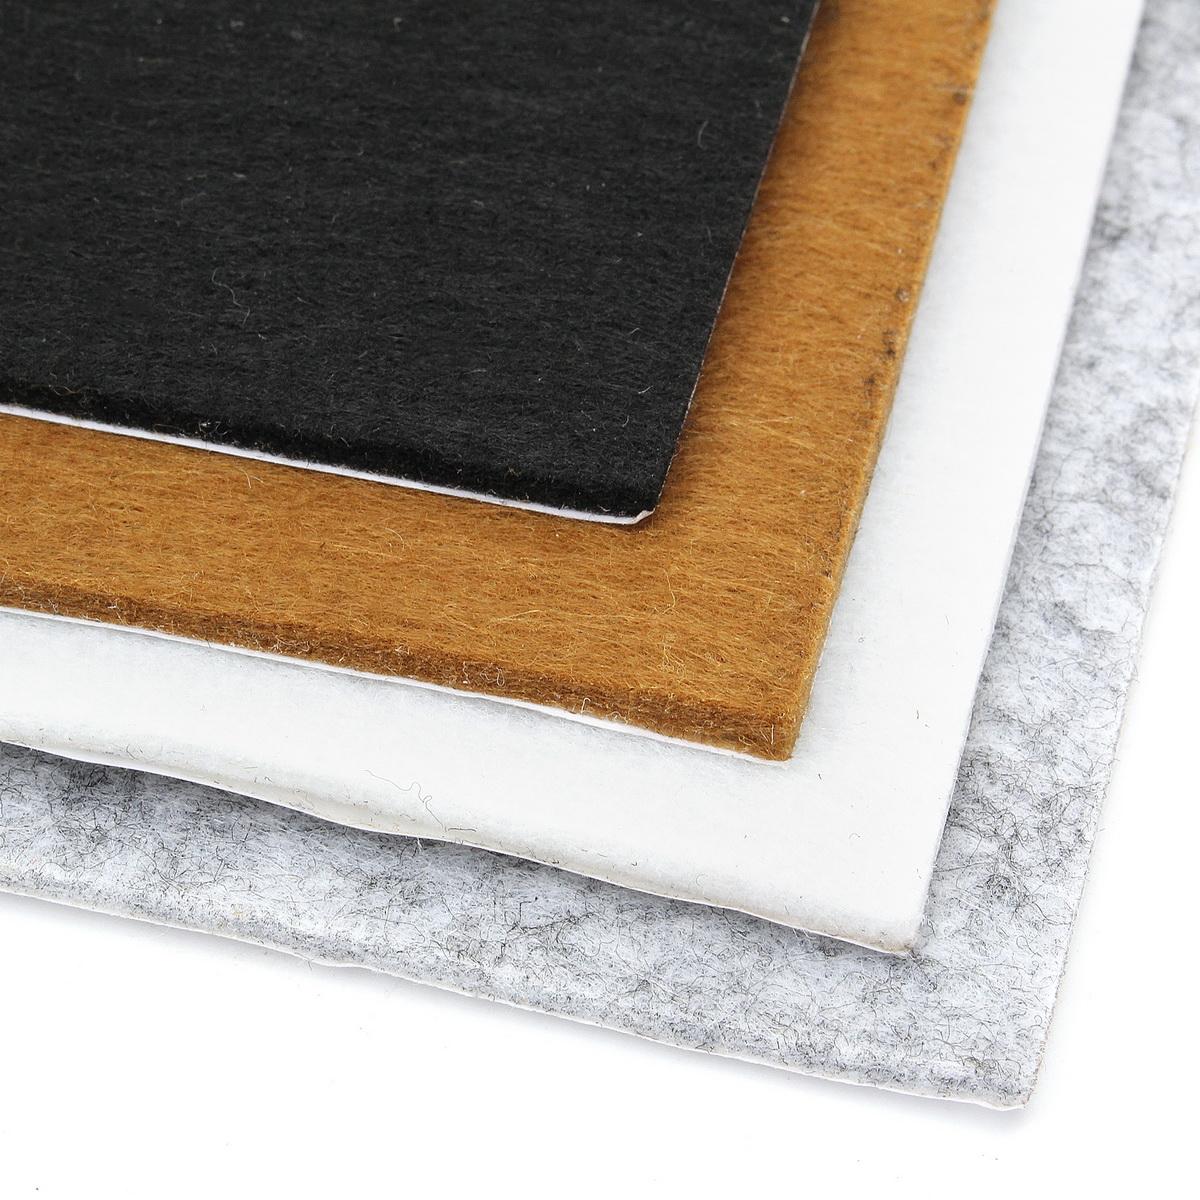 Felt Furniture Protection Pads Self Adhesive Anti Skid